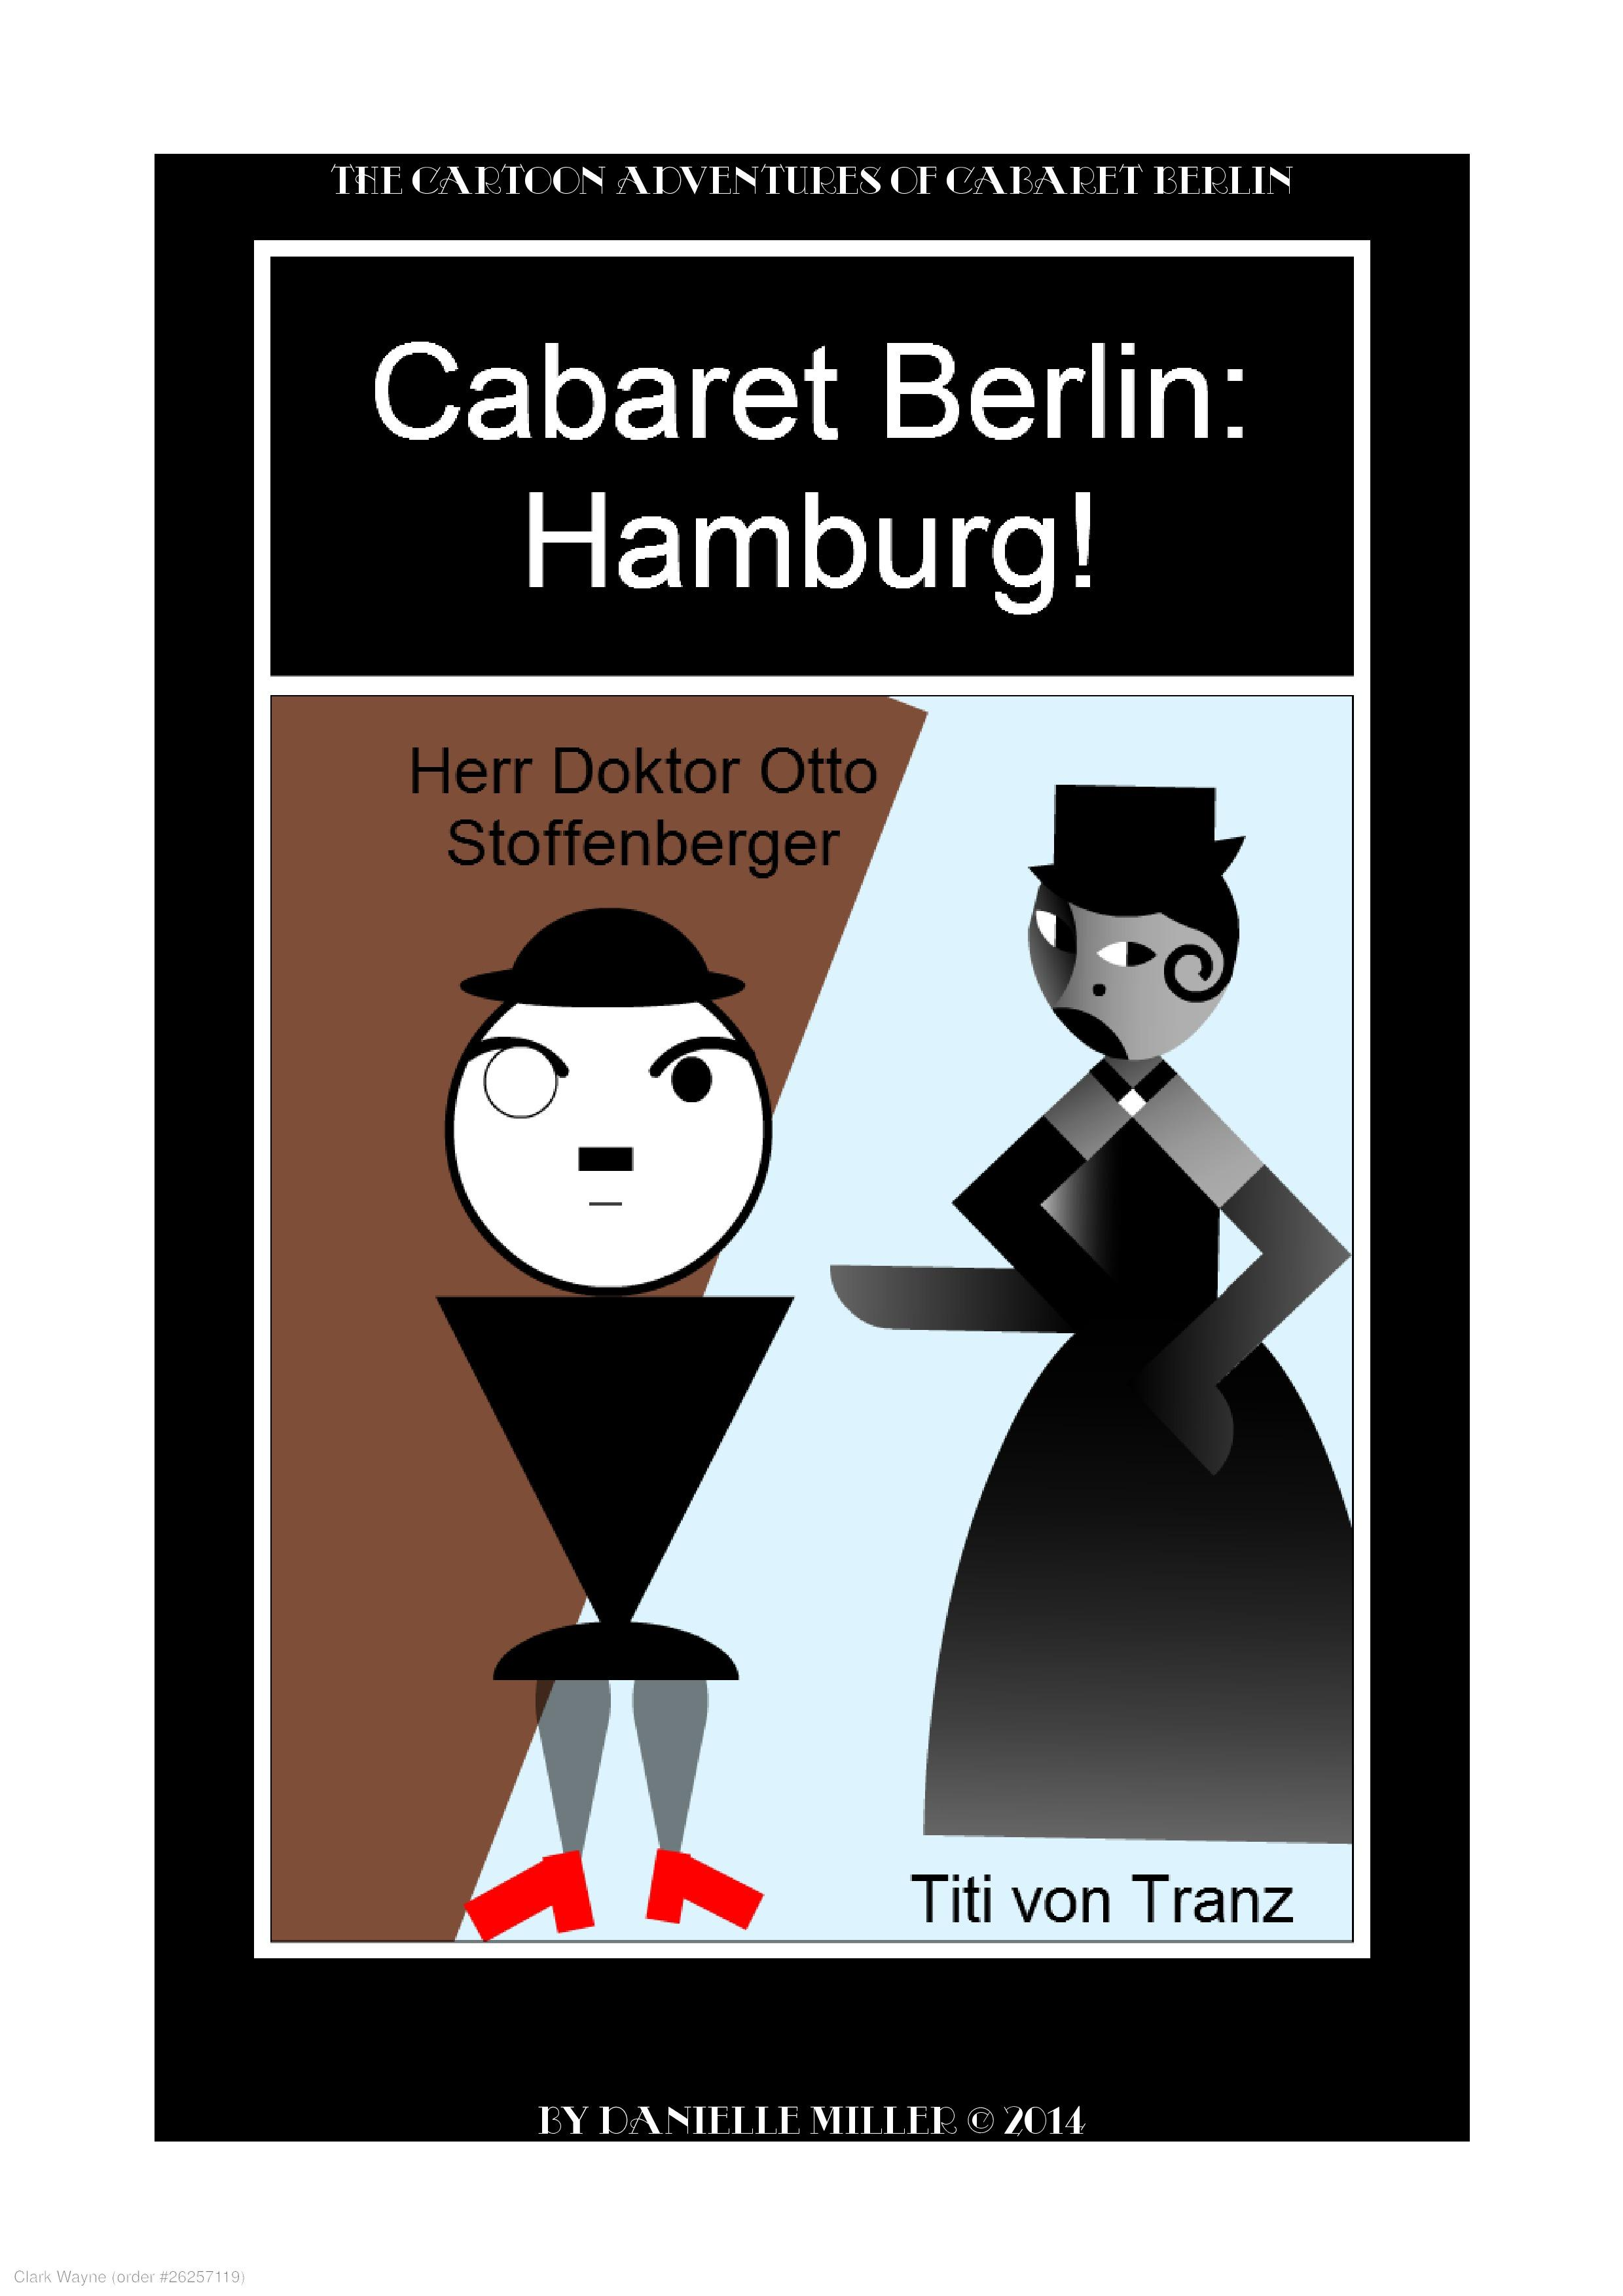 Cabaret Berlin 001 2014 digital TheRastaCrew